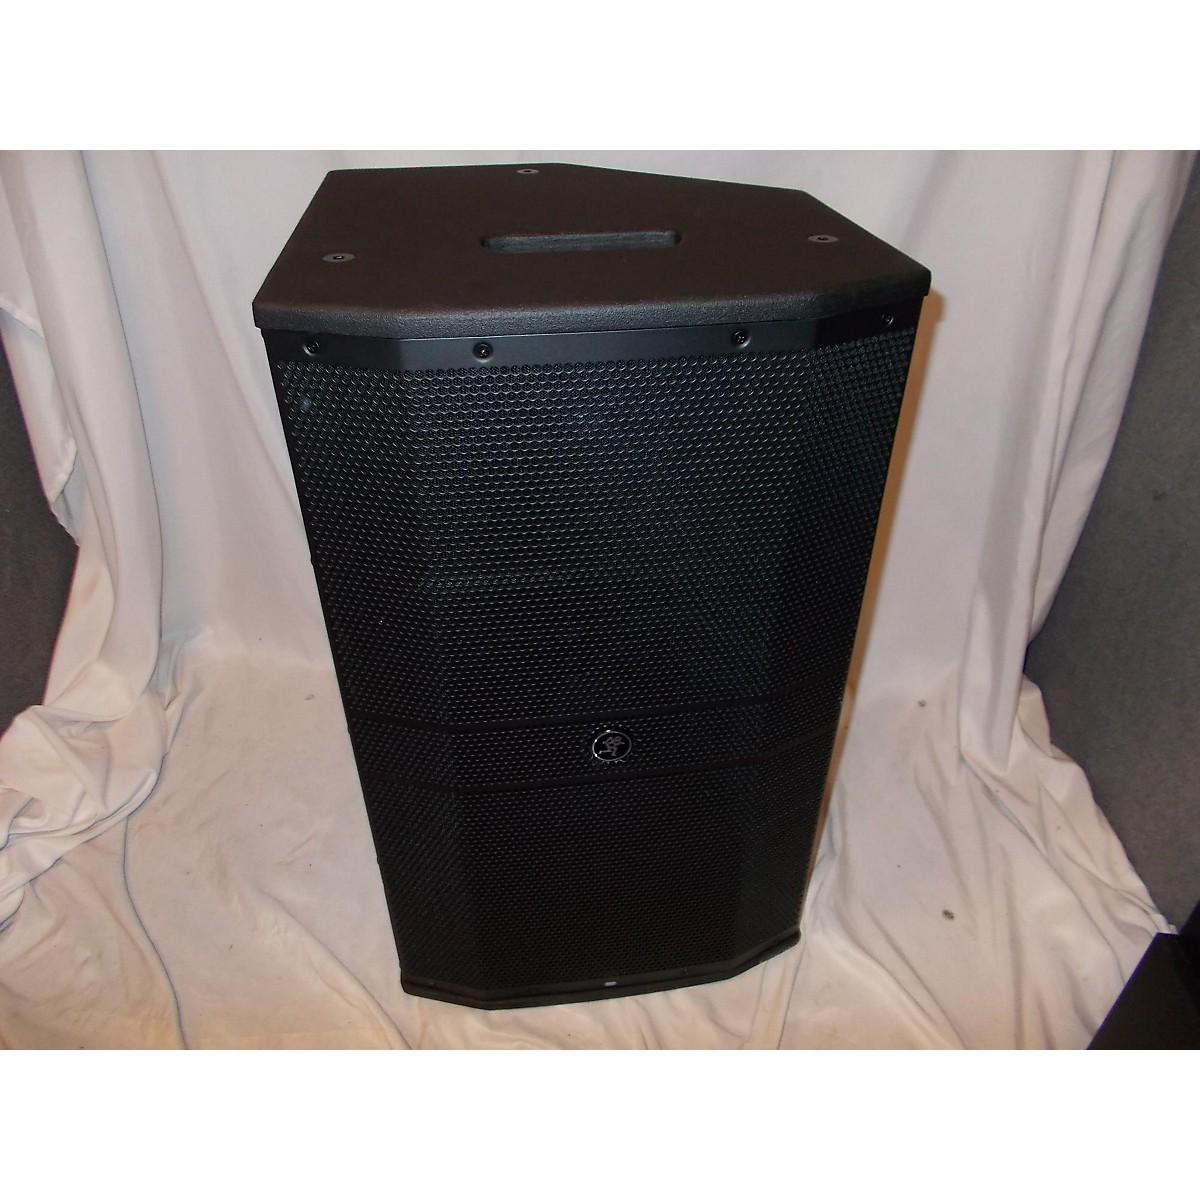 Mackie Drm212 Powered Speaker